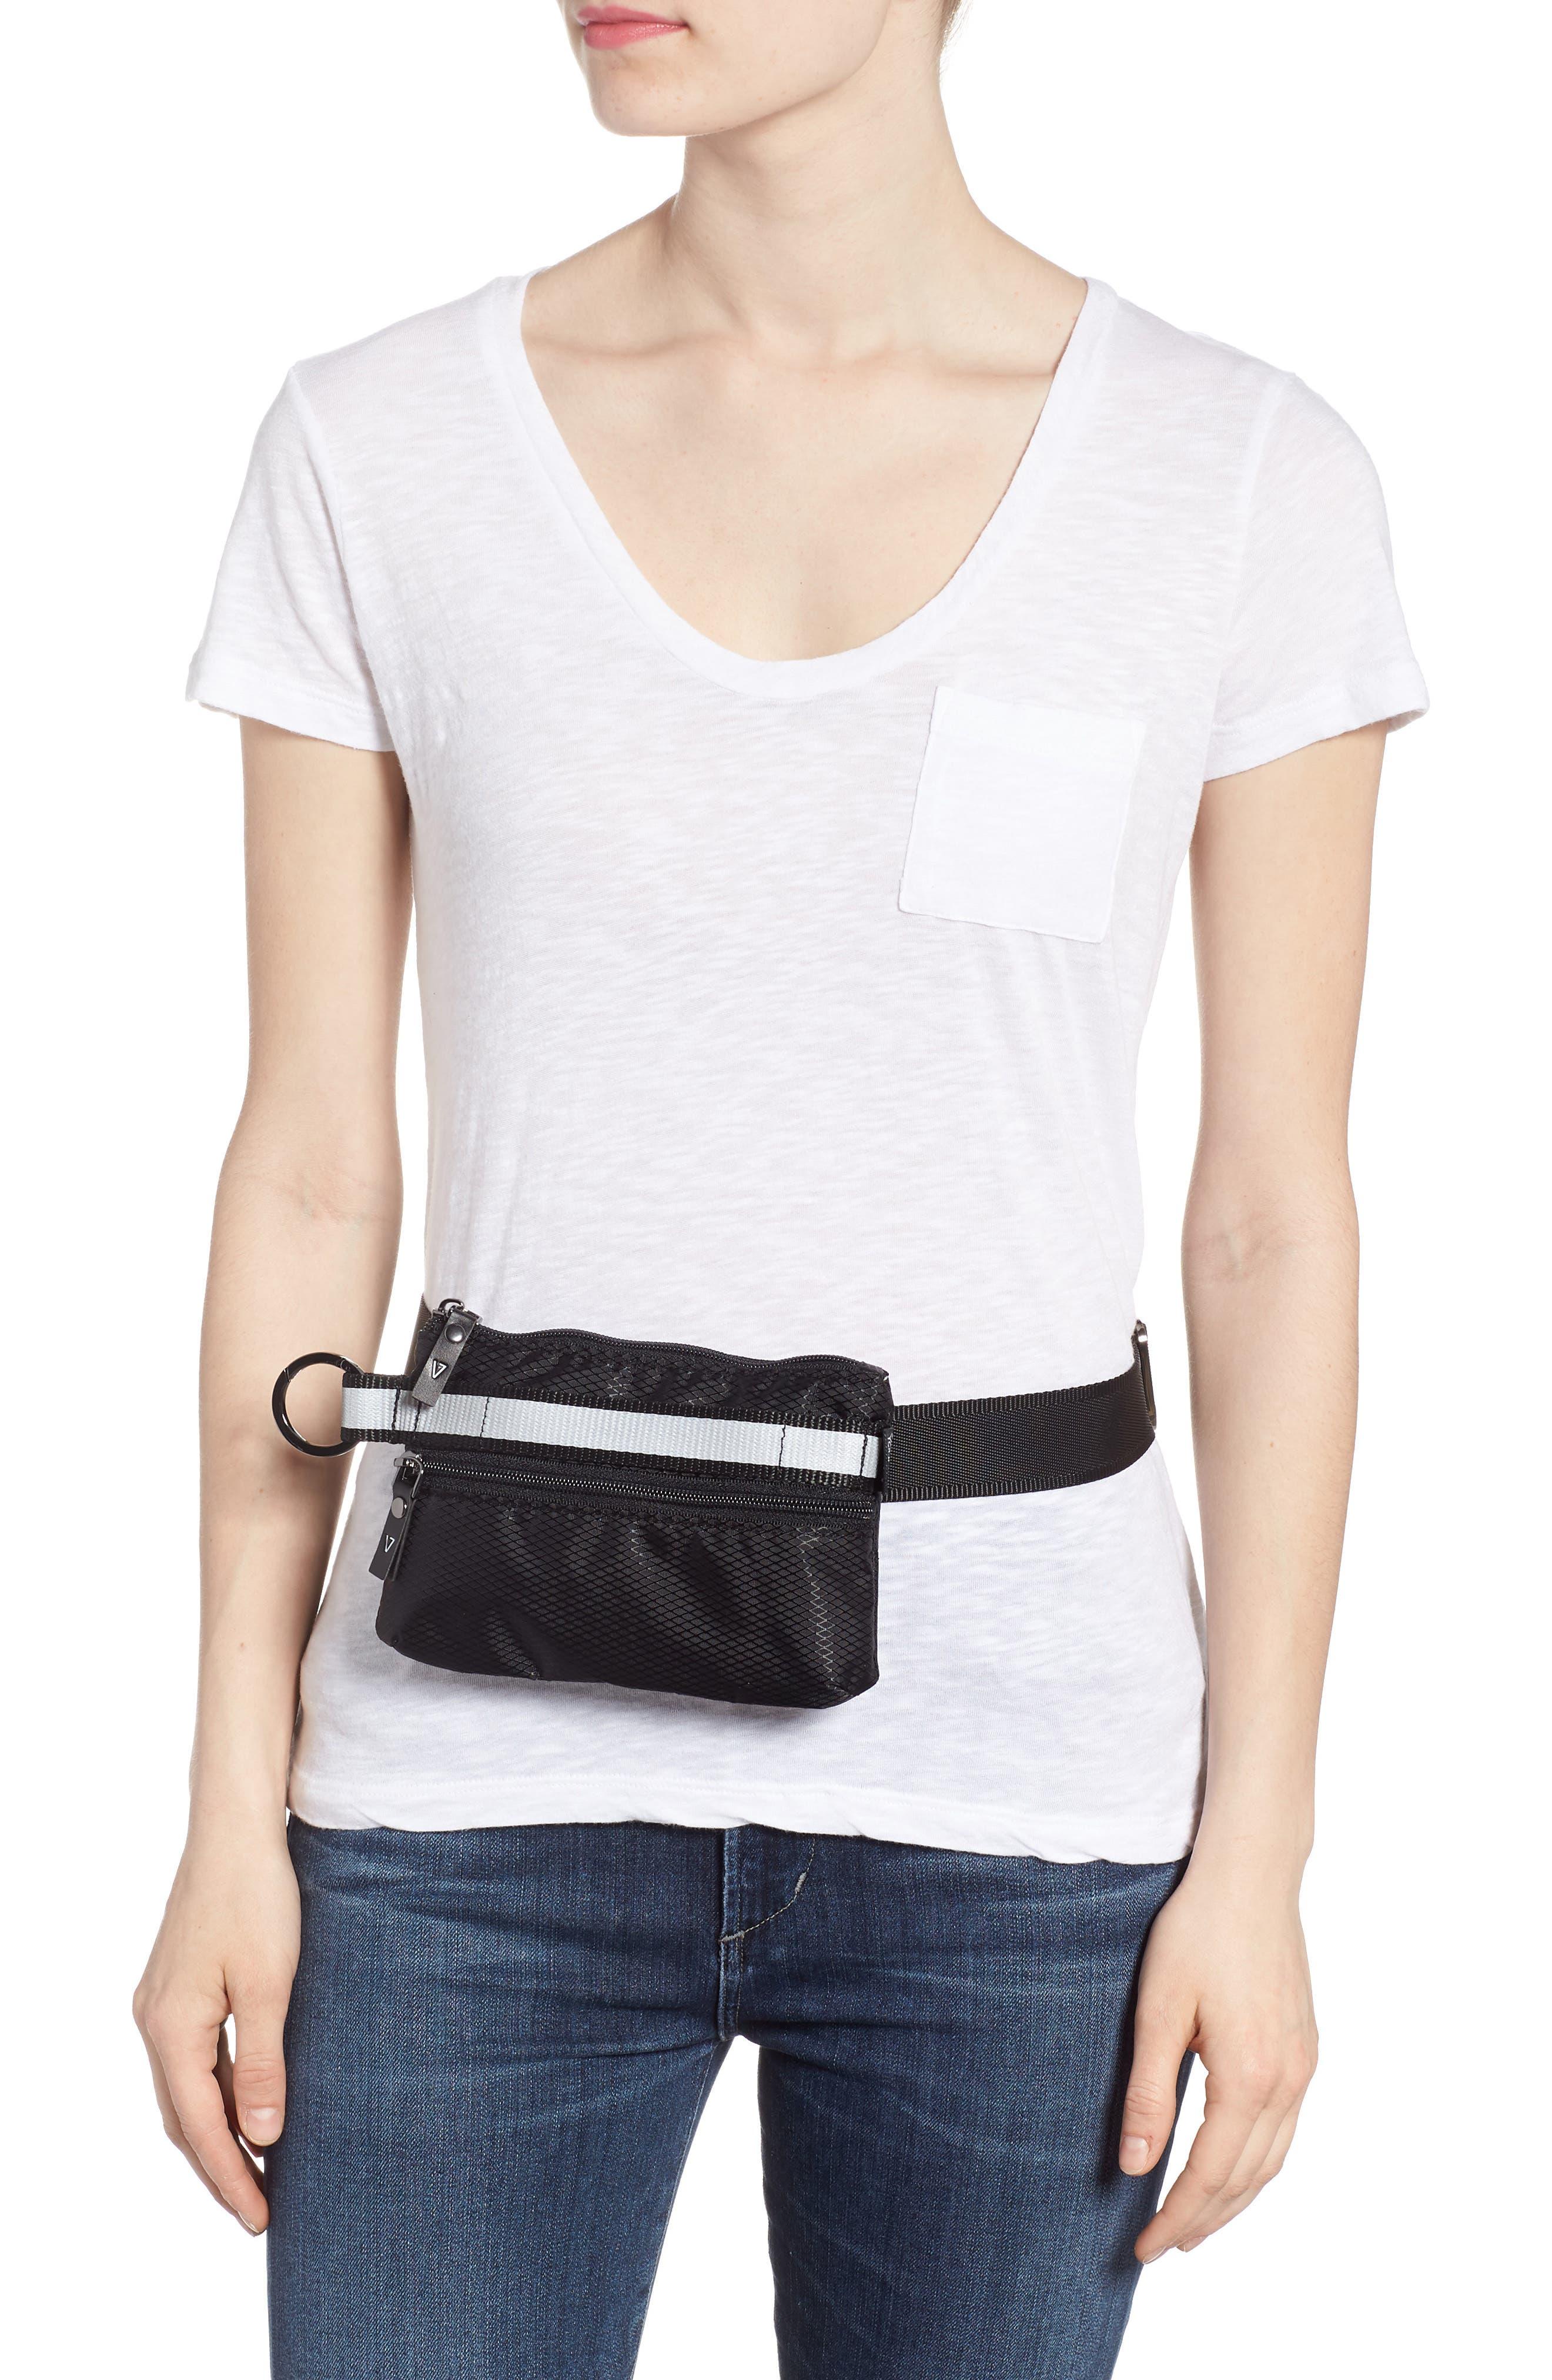 Urban Clutch Convertible Belt Bag,                             Alternate thumbnail 2, color,                             BLACK/ REFLECTIVE STRIPE